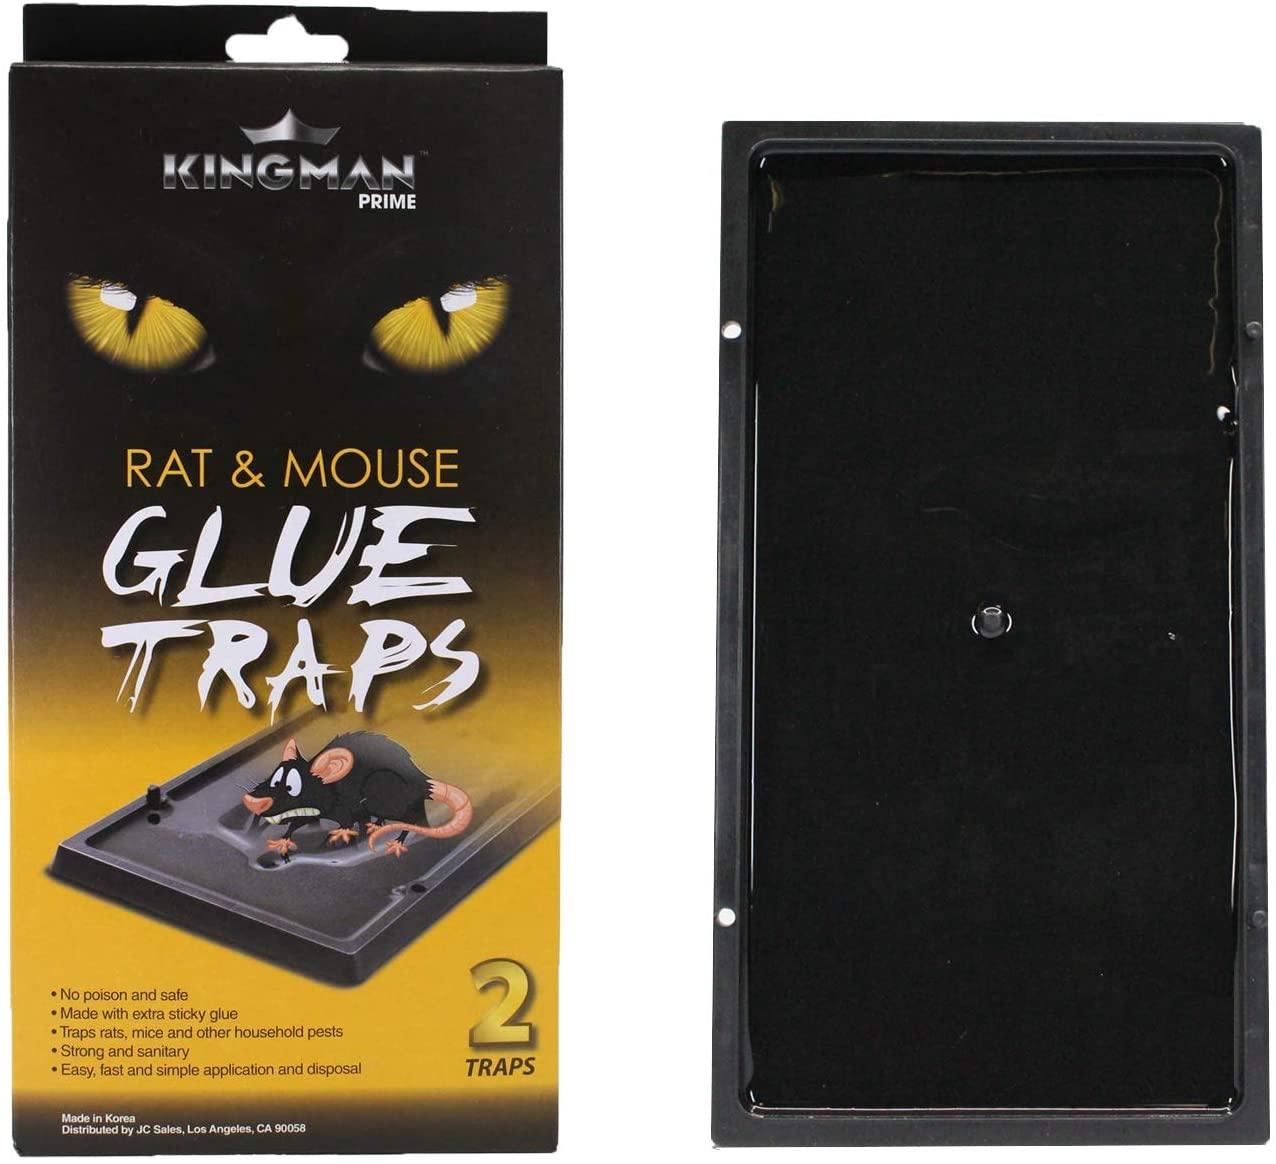 KINGMAN PRIME Medium Mouse Trap Rat Trap Glue Trap/Board (1 Pack / 2 Traps) Rodent Trap Safe Easy Non-Toxic